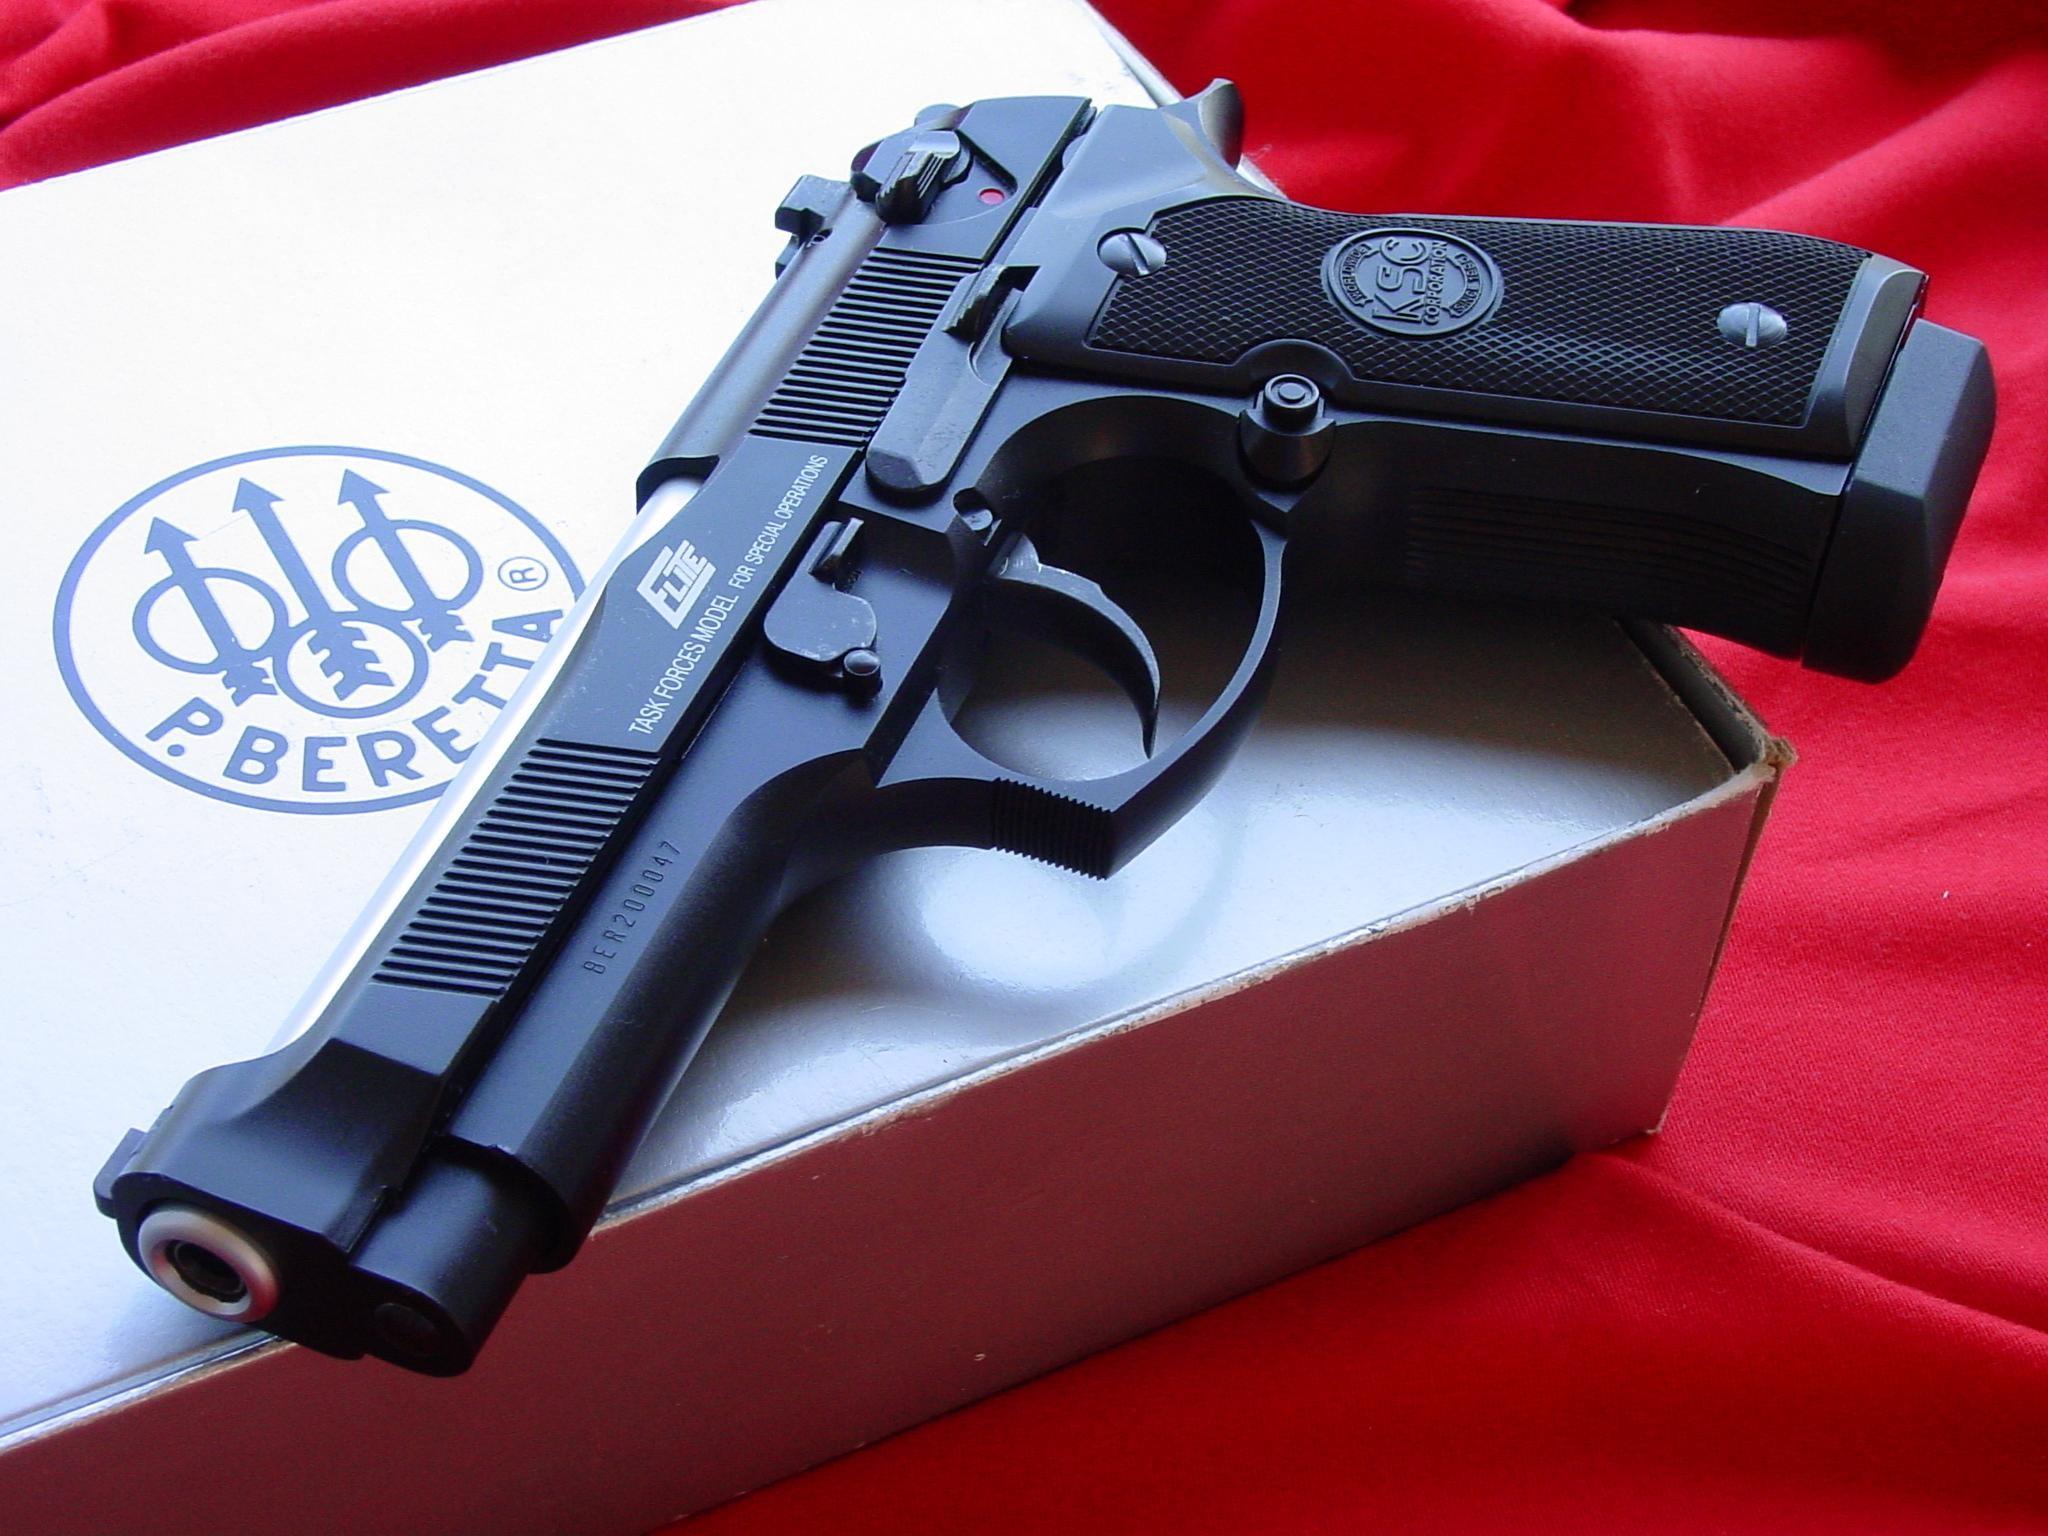 Res: 2048x1536, Glock Gun Wallpaper For Desktop High Quality Download 2048×1536